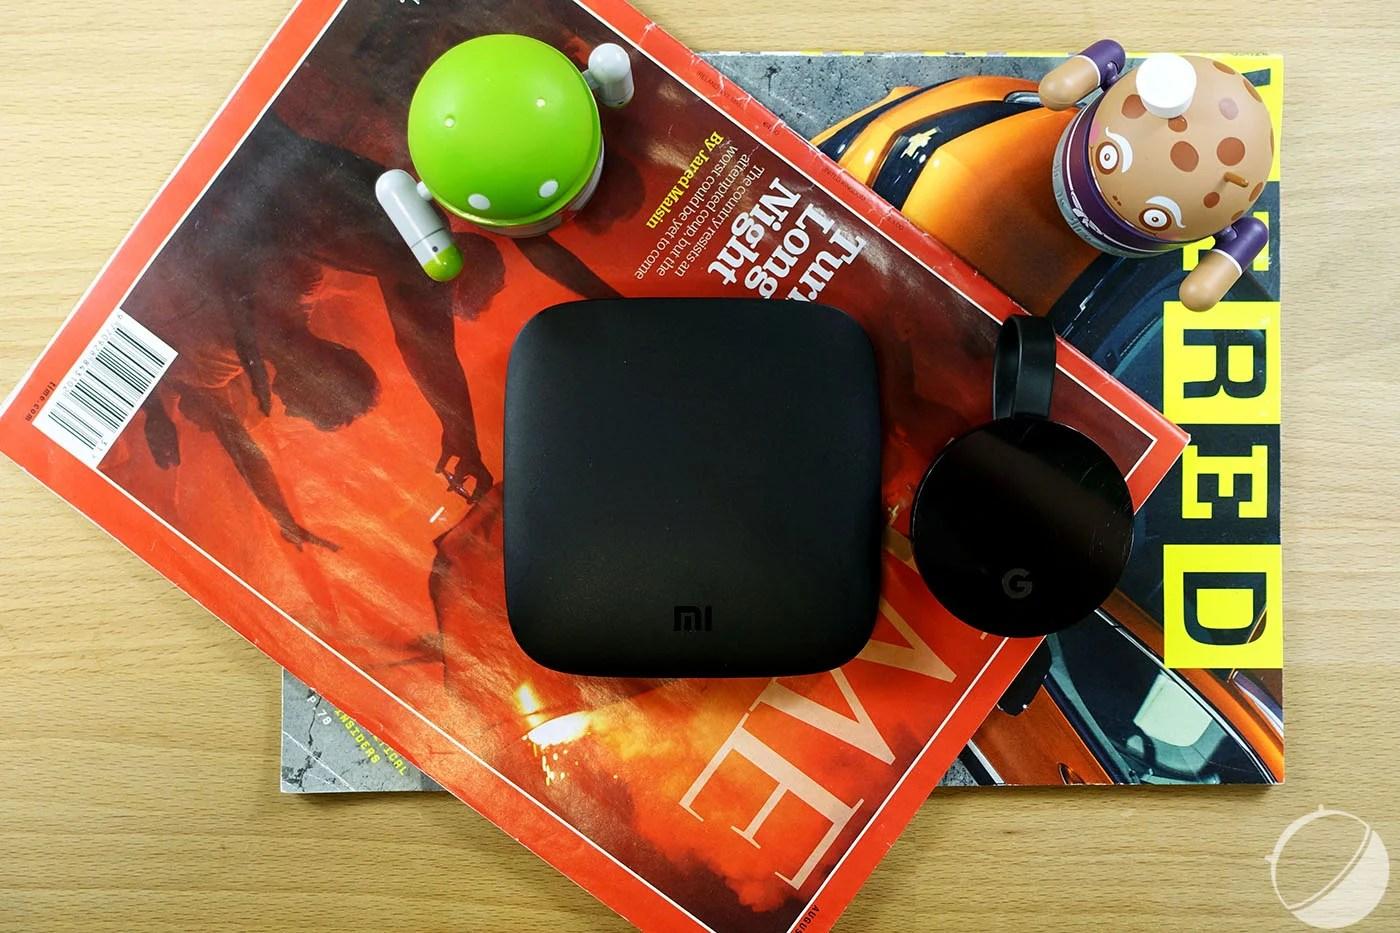 Test de la Xiaomi Mi Box, la meilleure box TV 4K à petit prix